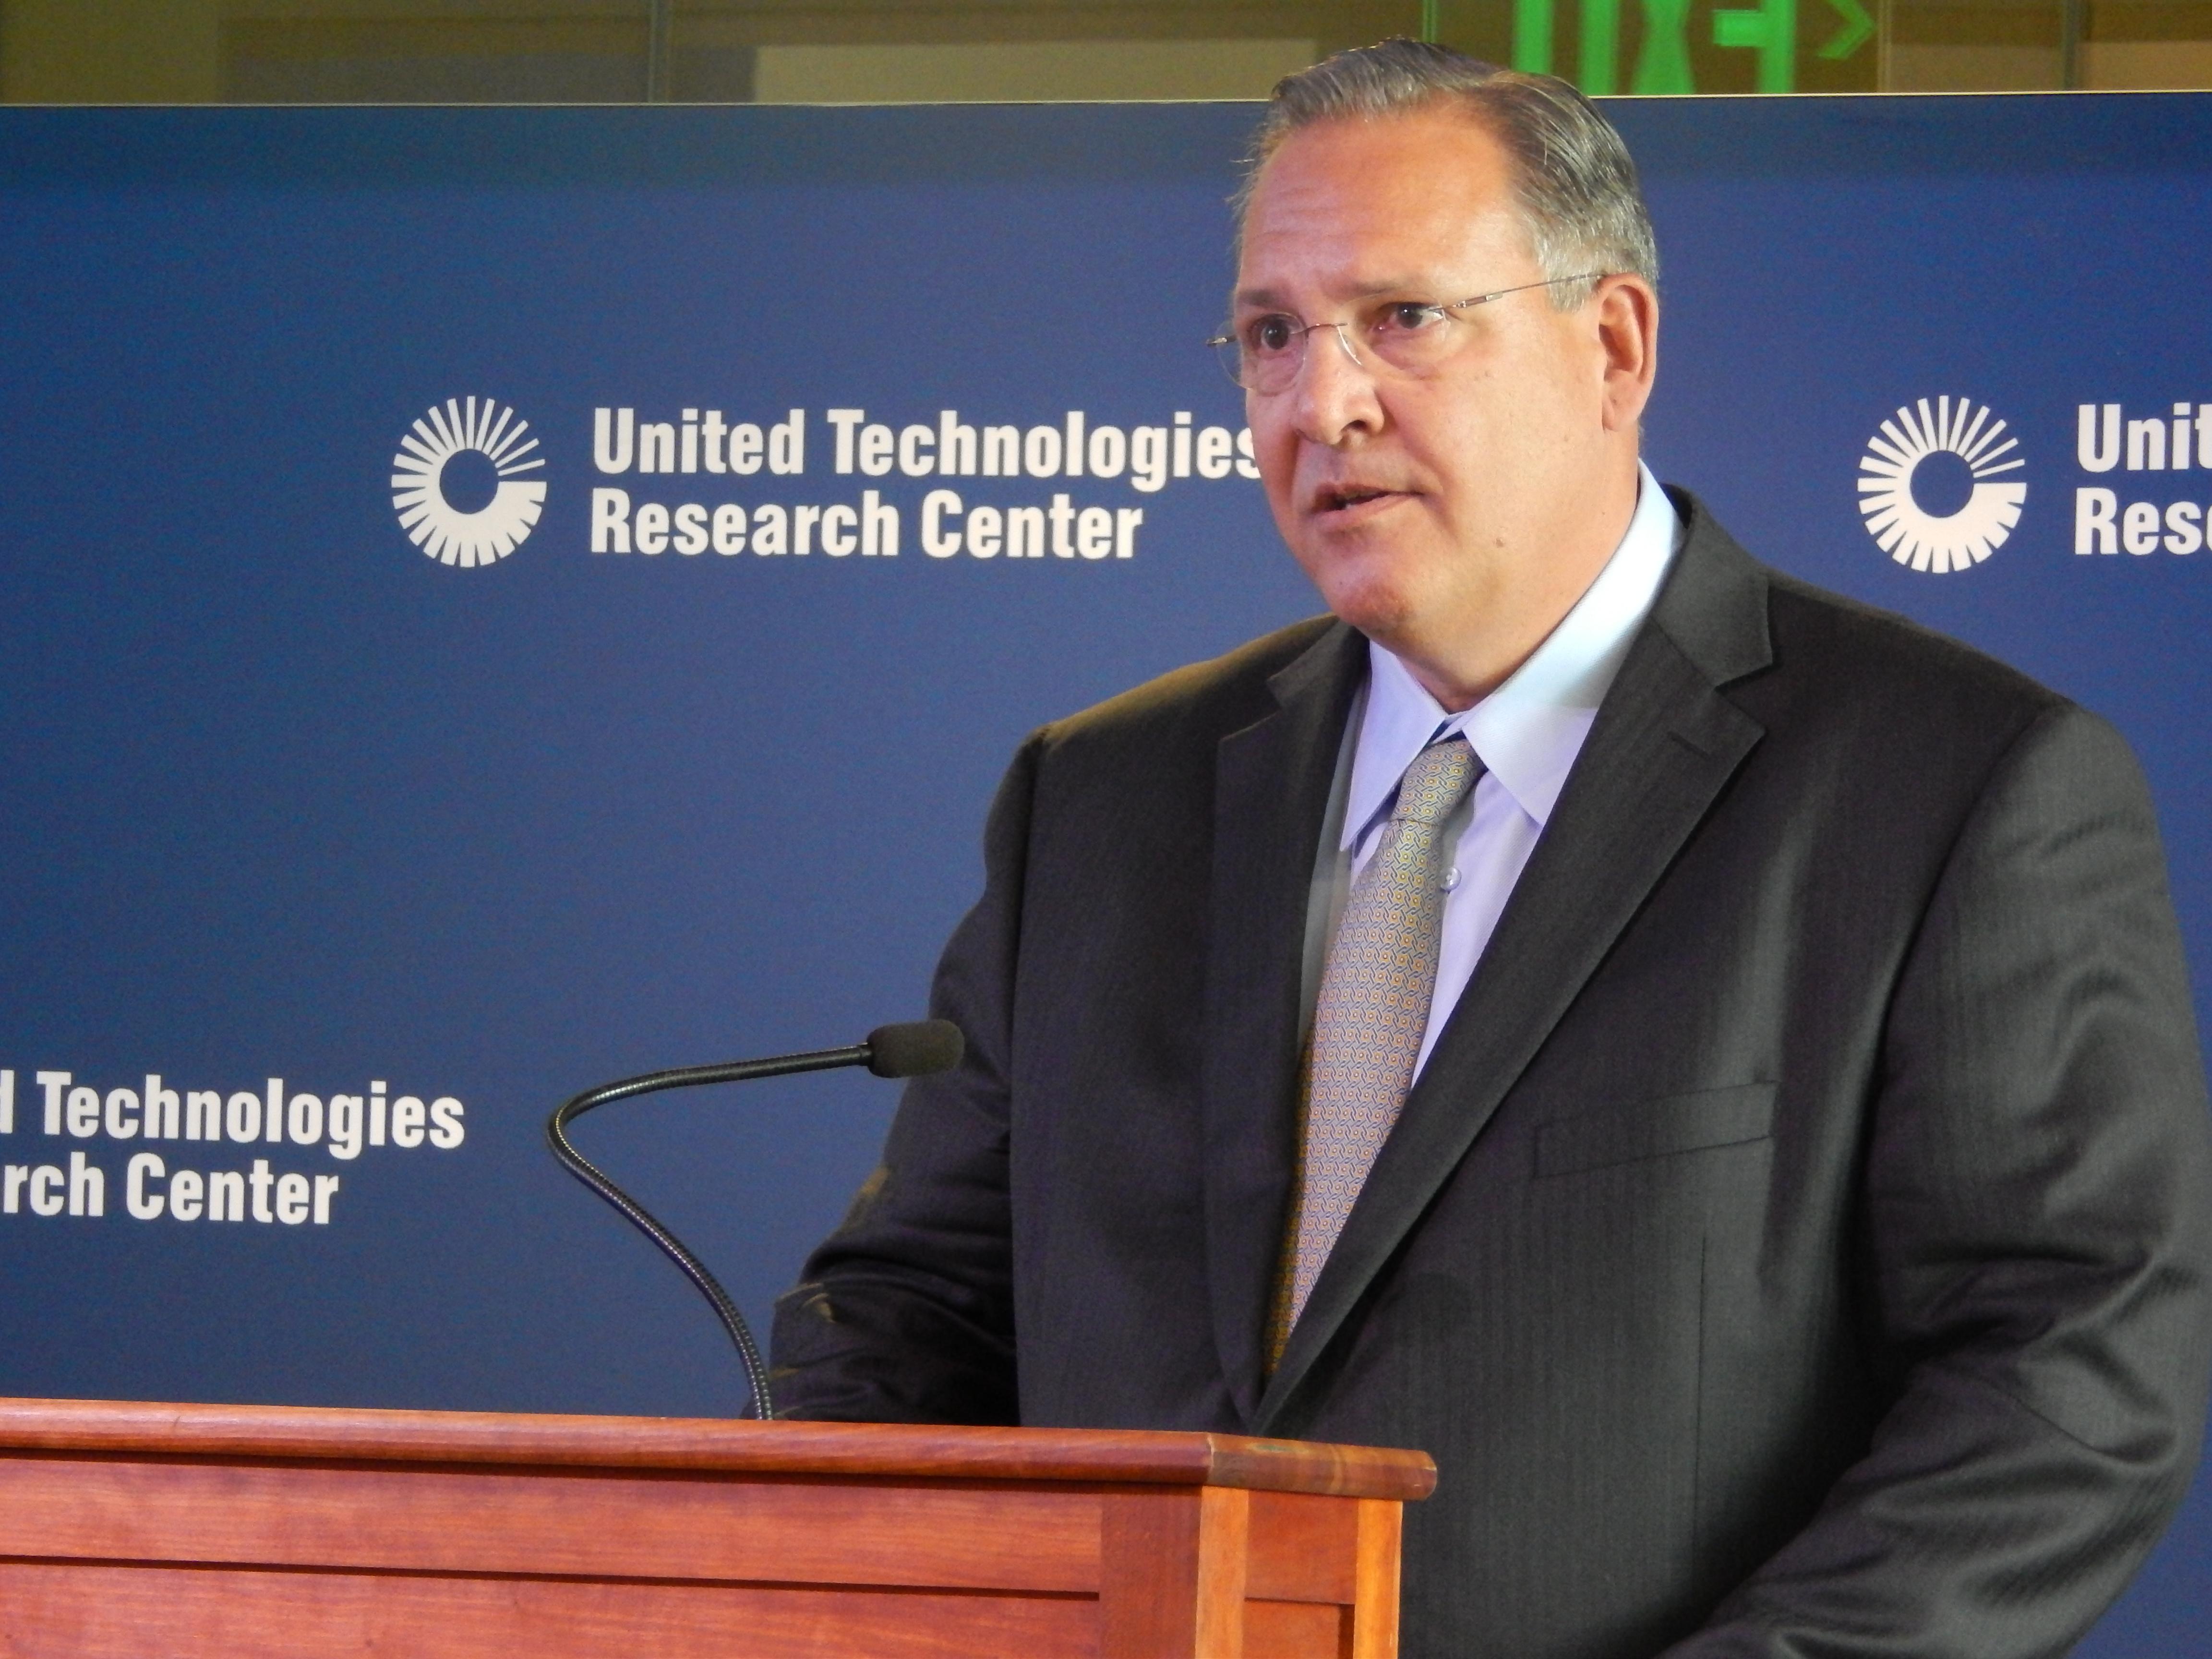 UTC consolation: Otis to remain, Pratt to hire 1,000